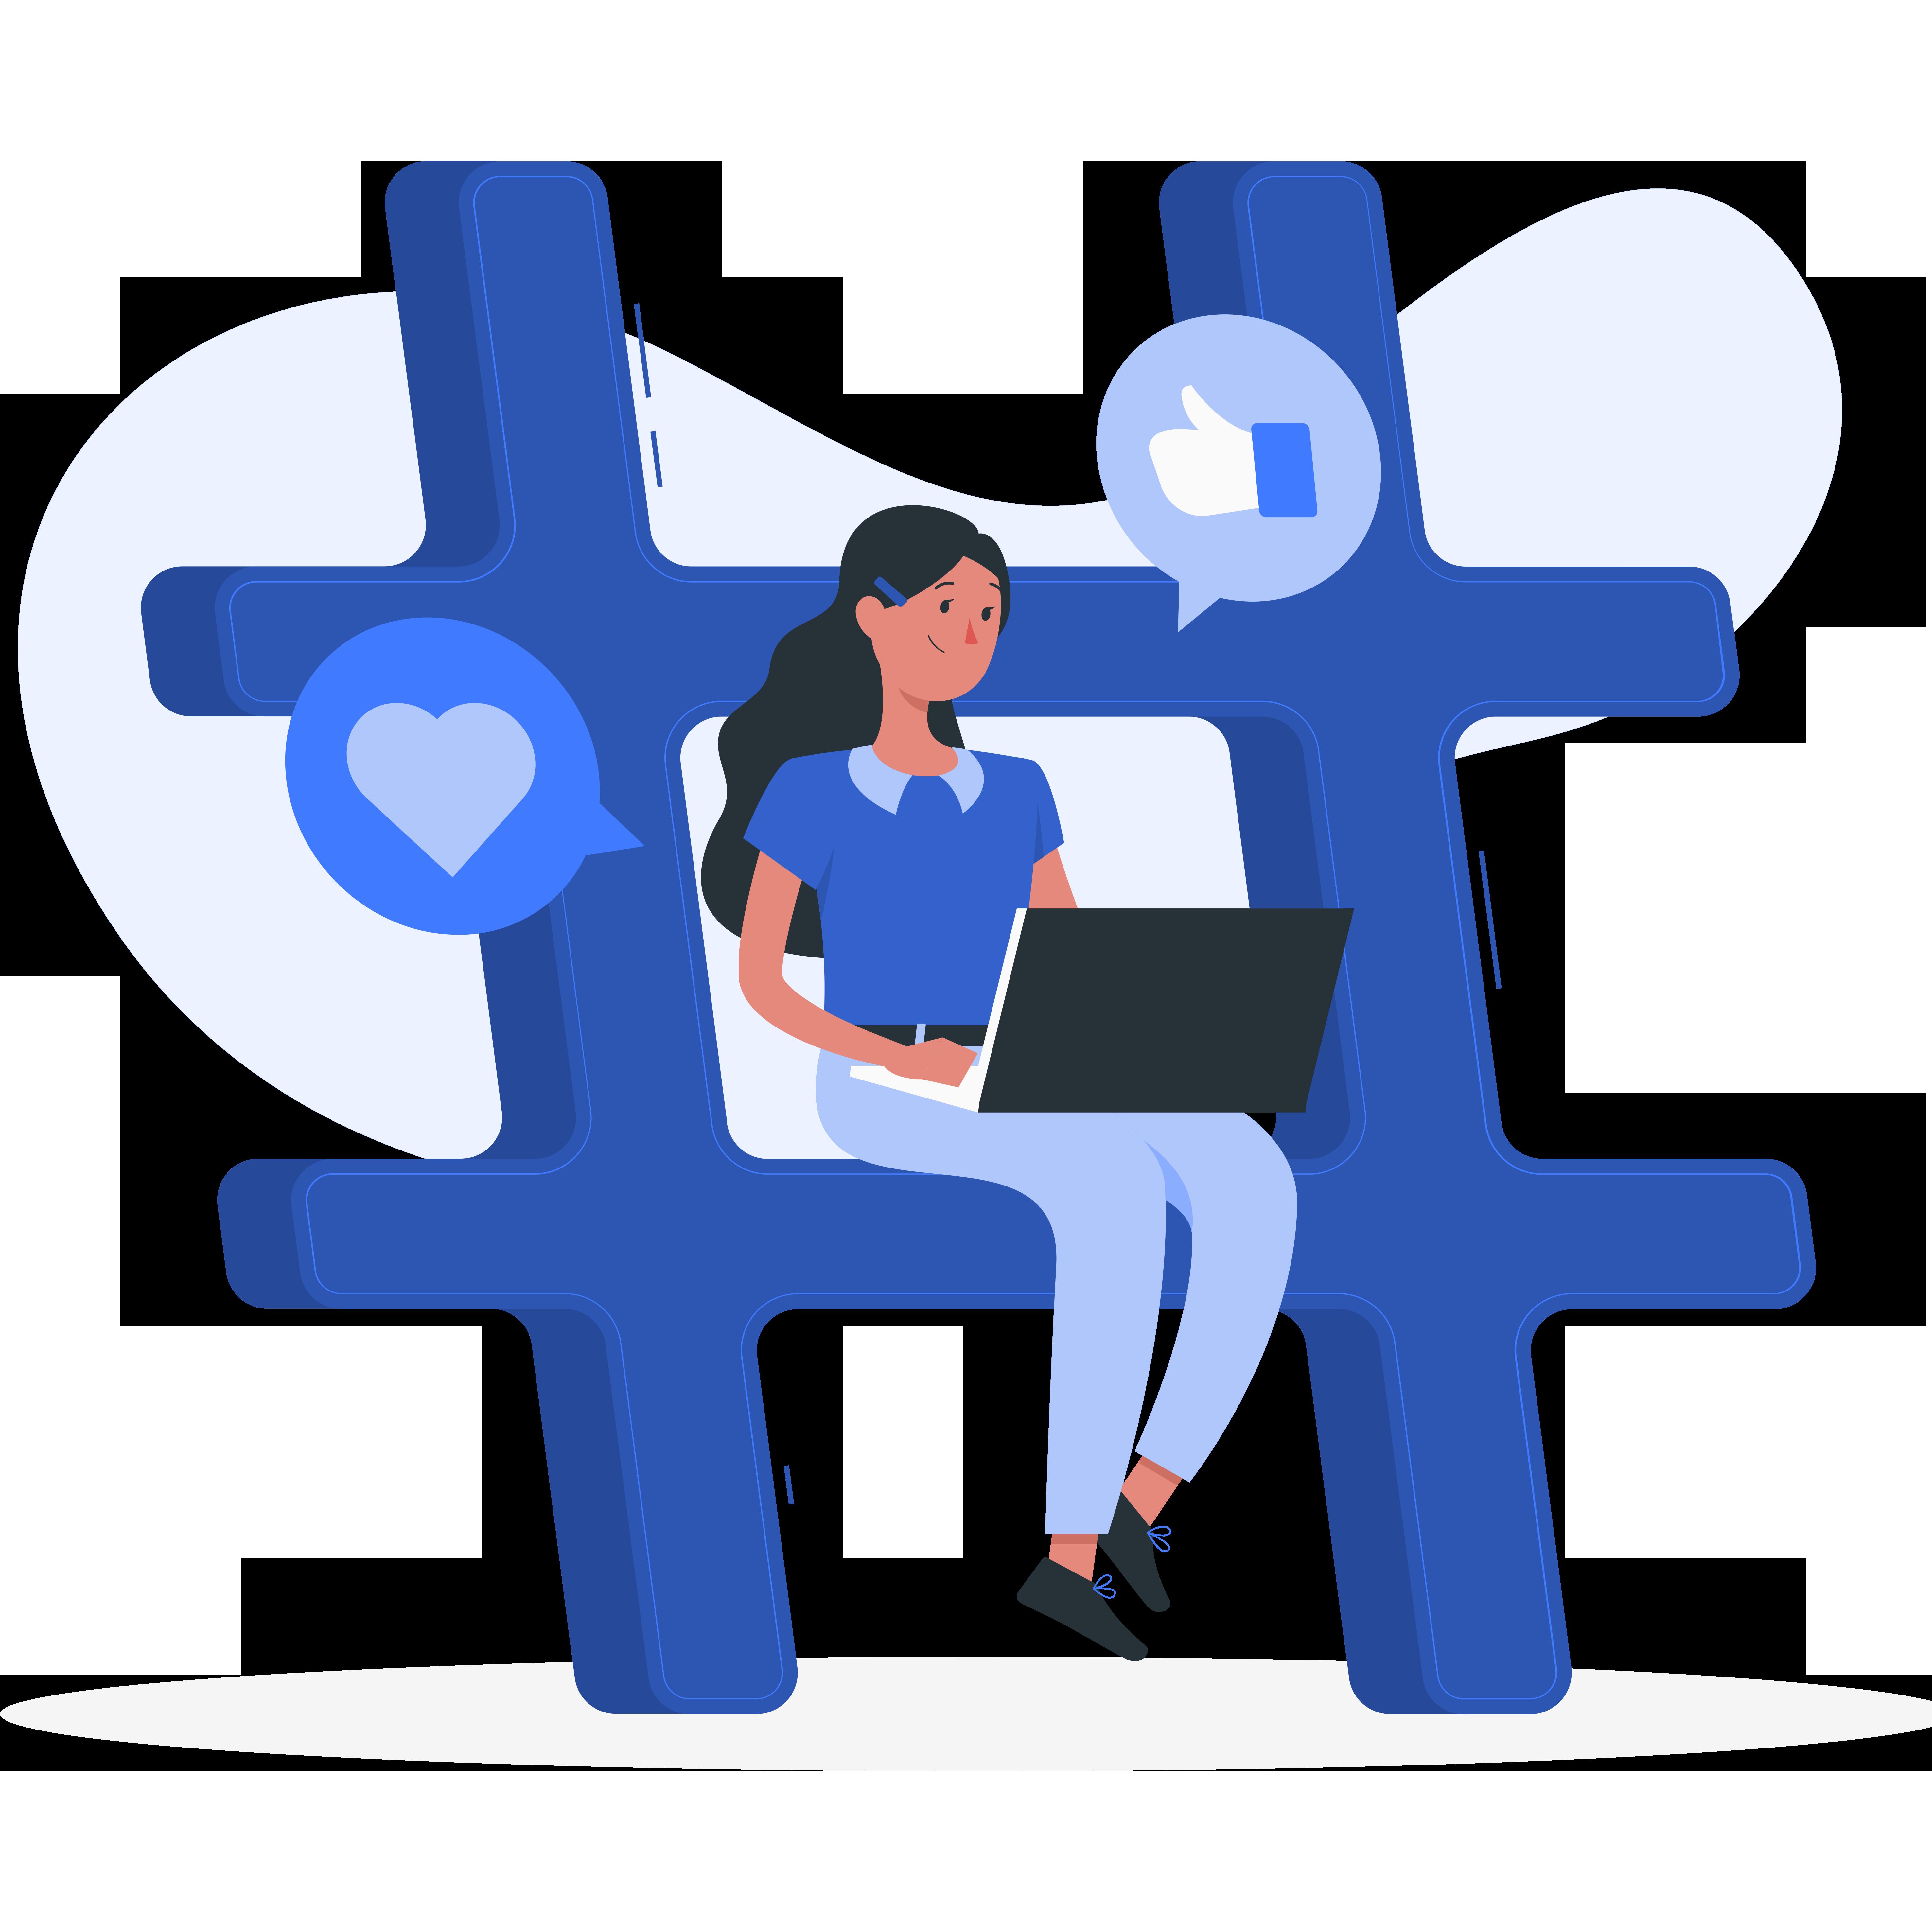 Social-Media as a channel